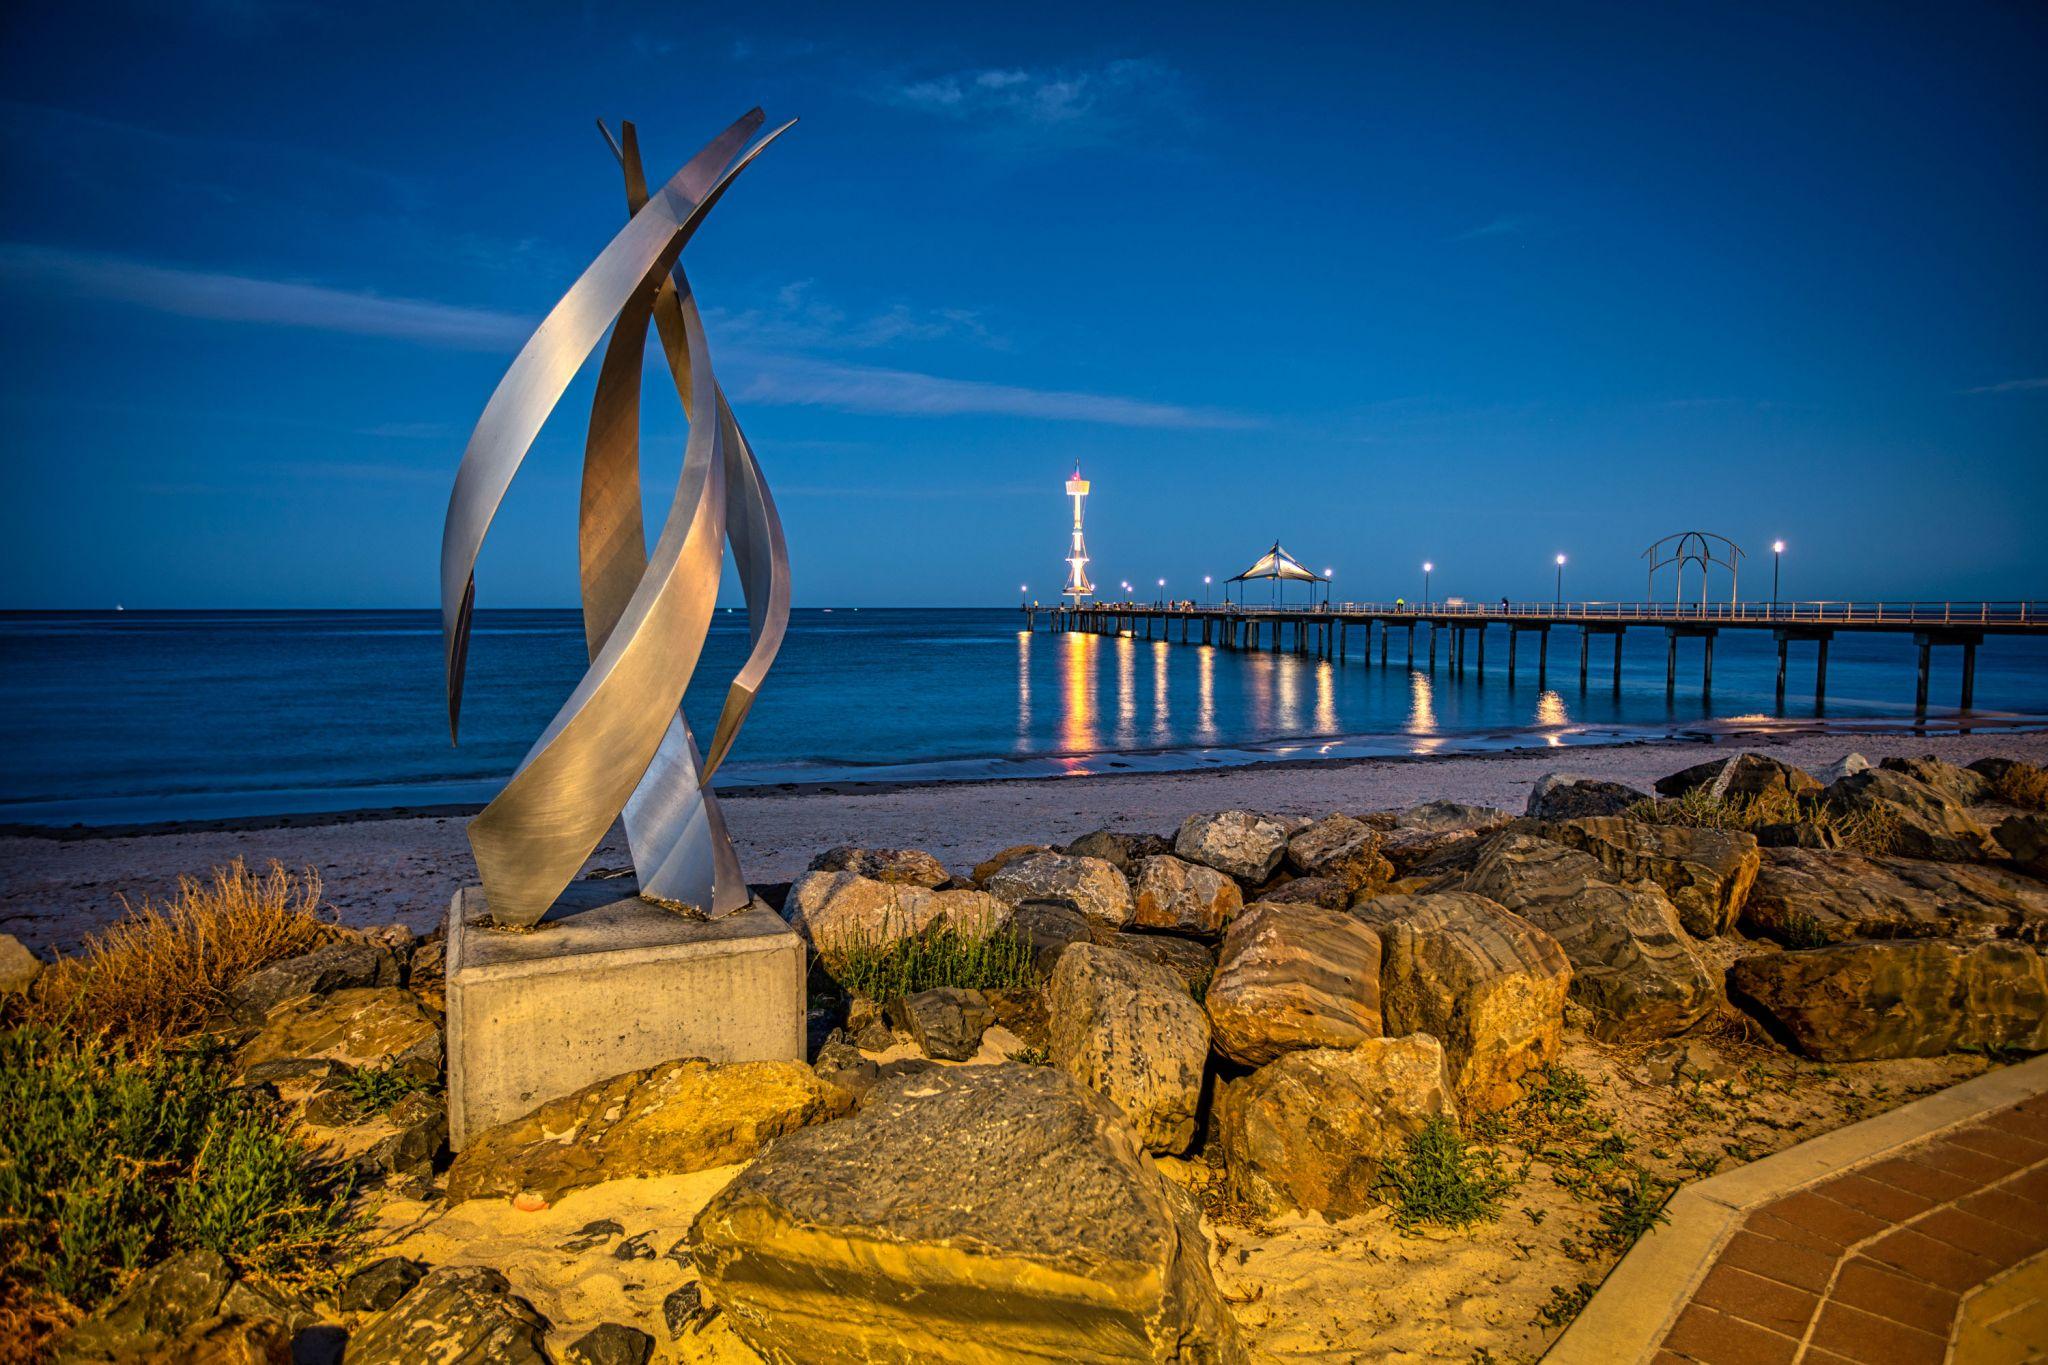 Brighton Pier, blue hour & Sculpture, Adelaide, SA, Australia